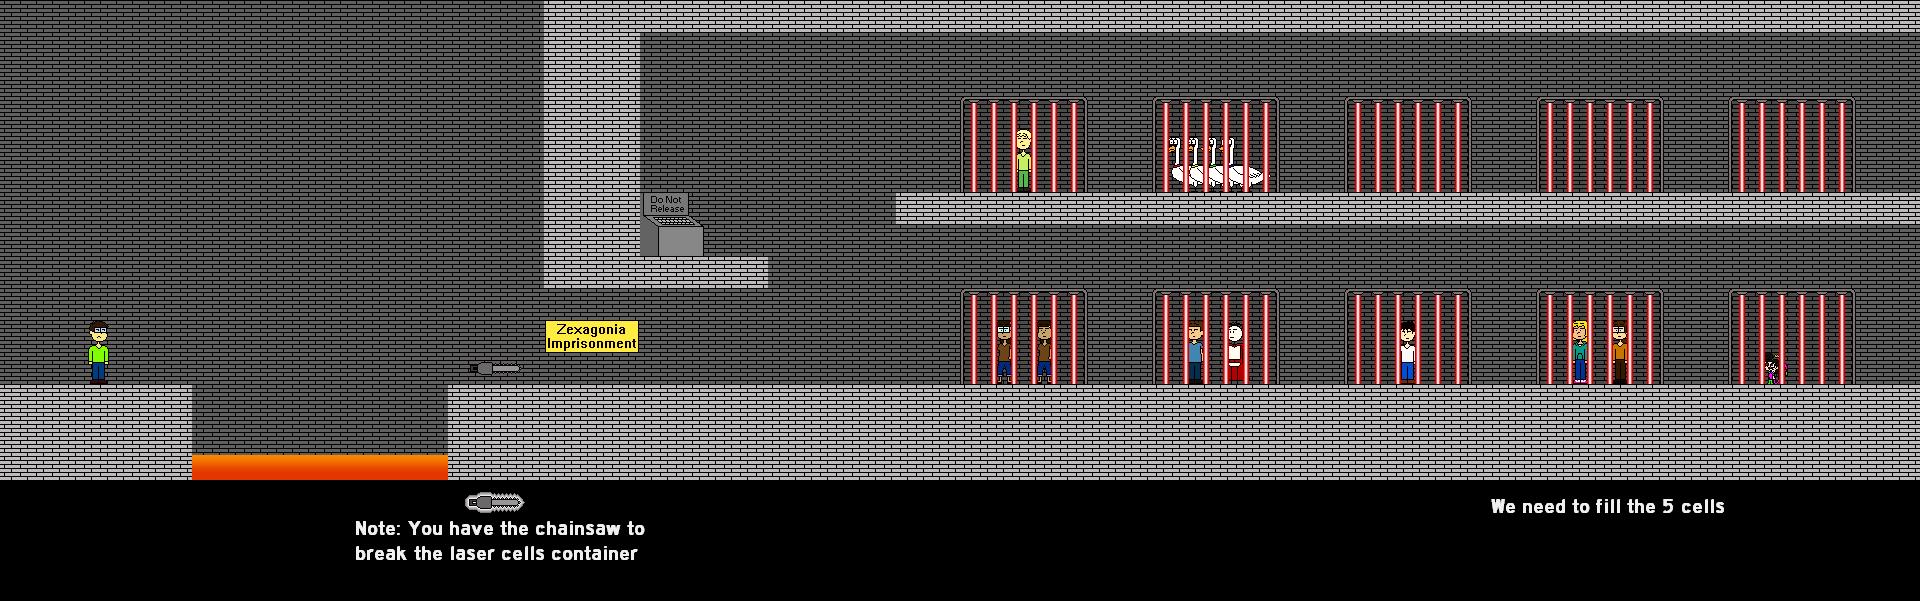 ASvtH - Zexagonia Imprisonment Map by Belinda-Emily-Back